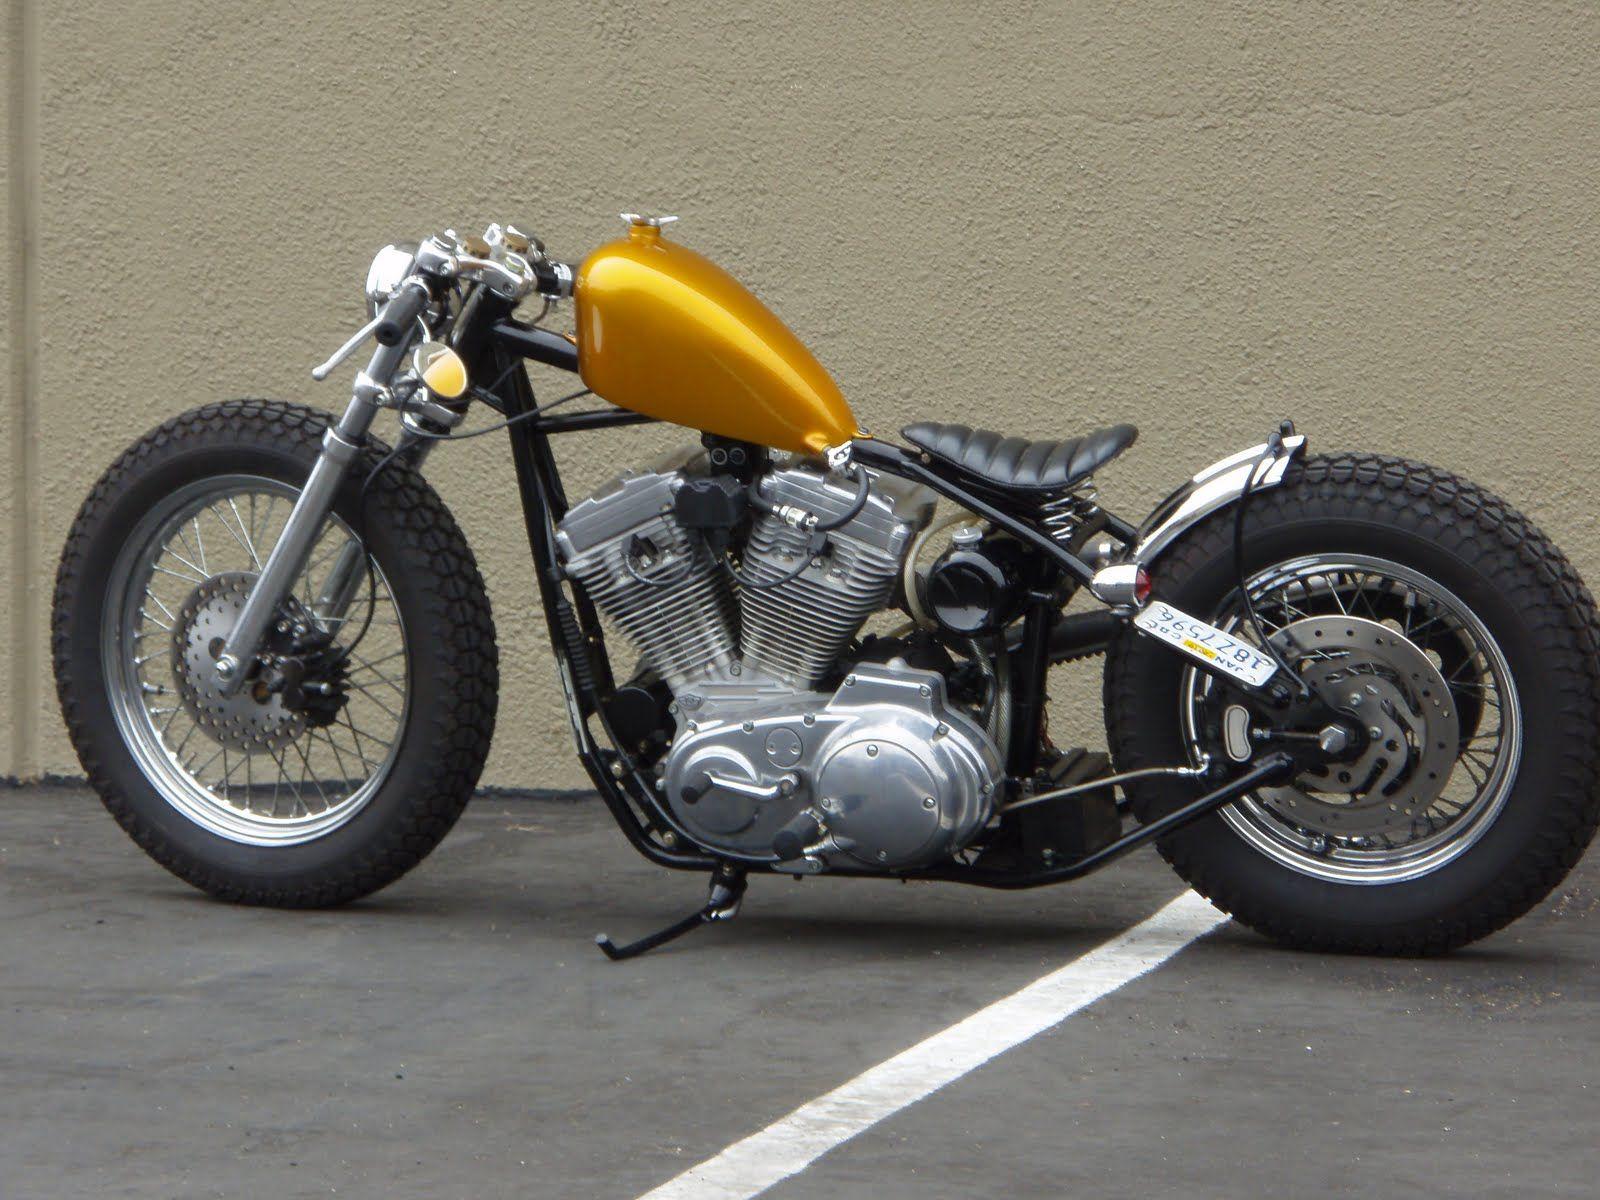 Harley-Davidson XL Sportster | Hot Bikes | Motorcycle ...